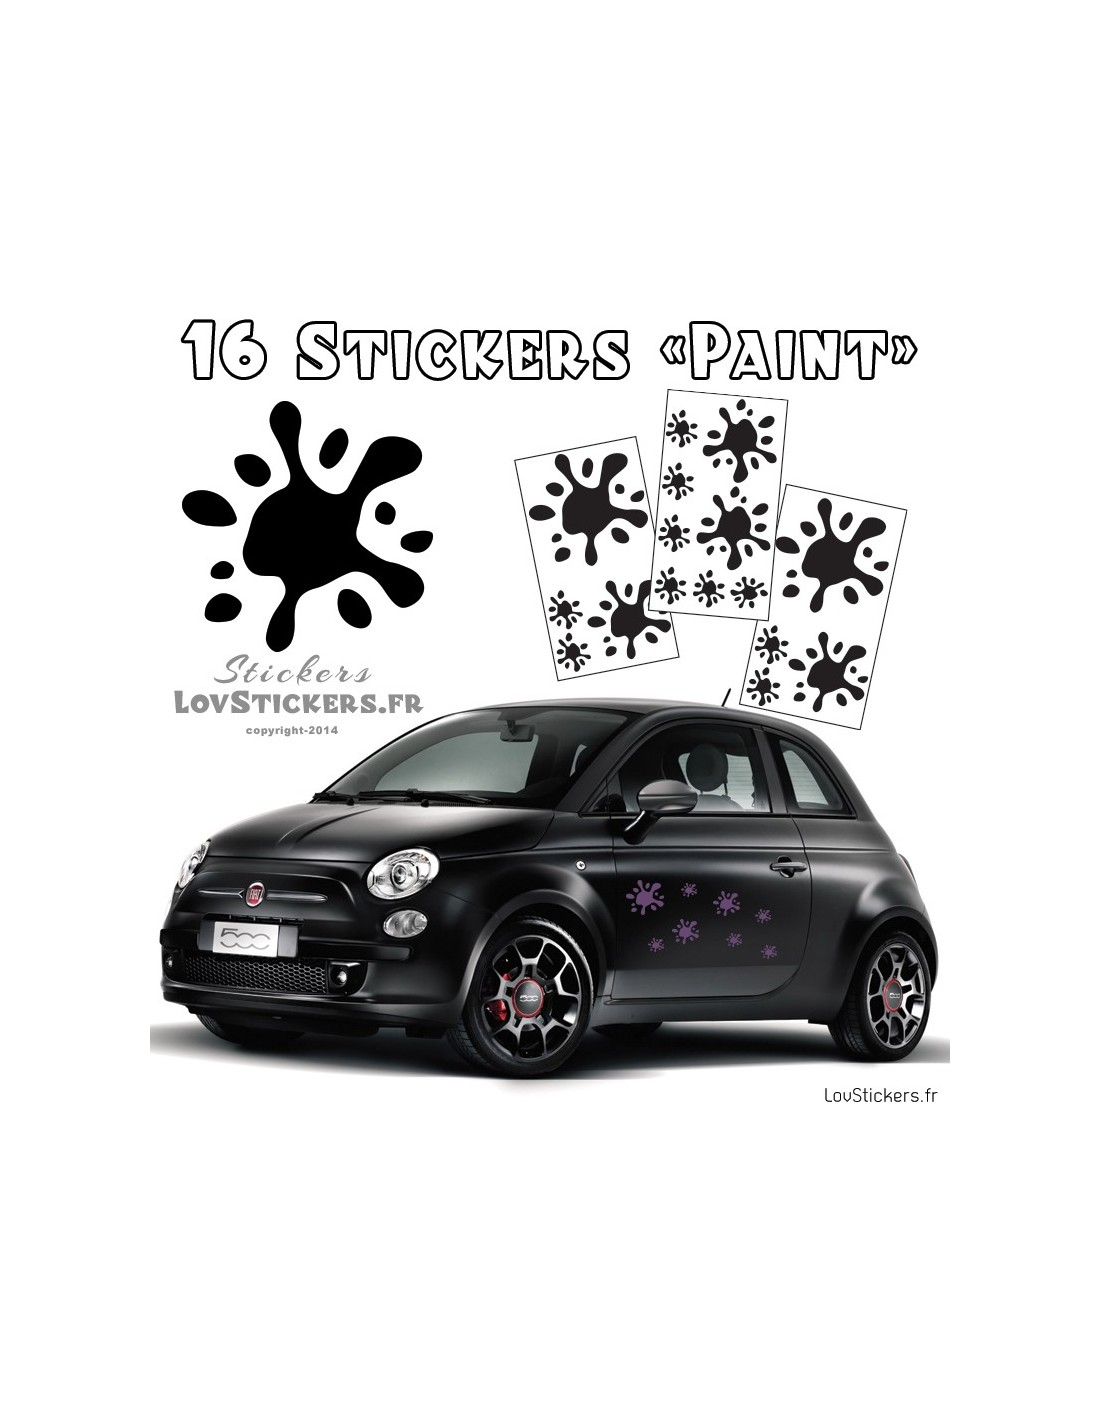 16 stickers tache de peinture deco 9 99. Black Bedroom Furniture Sets. Home Design Ideas